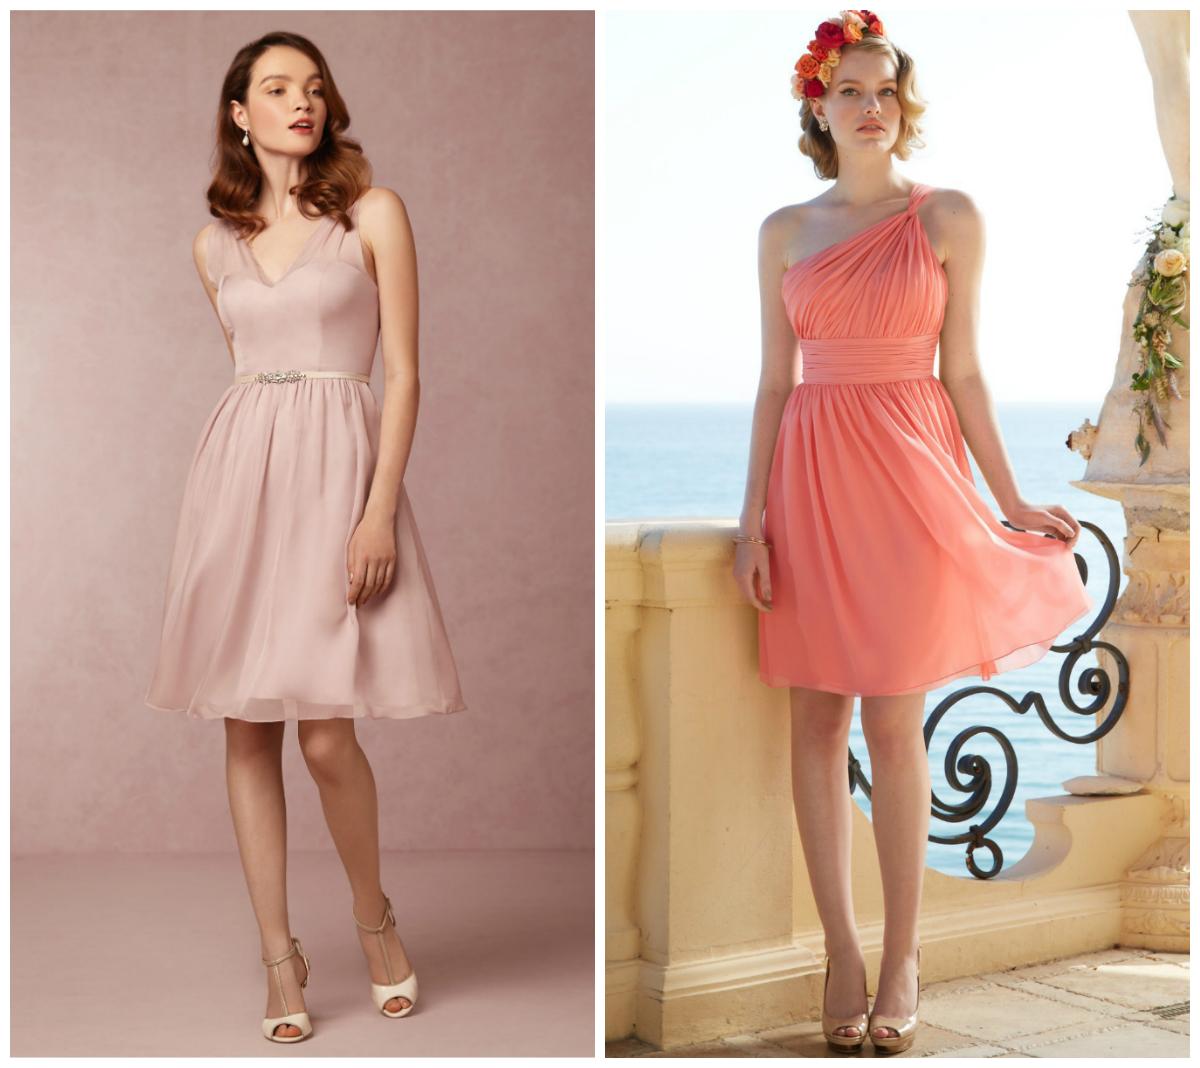 sukienki-eksponujace-nogi